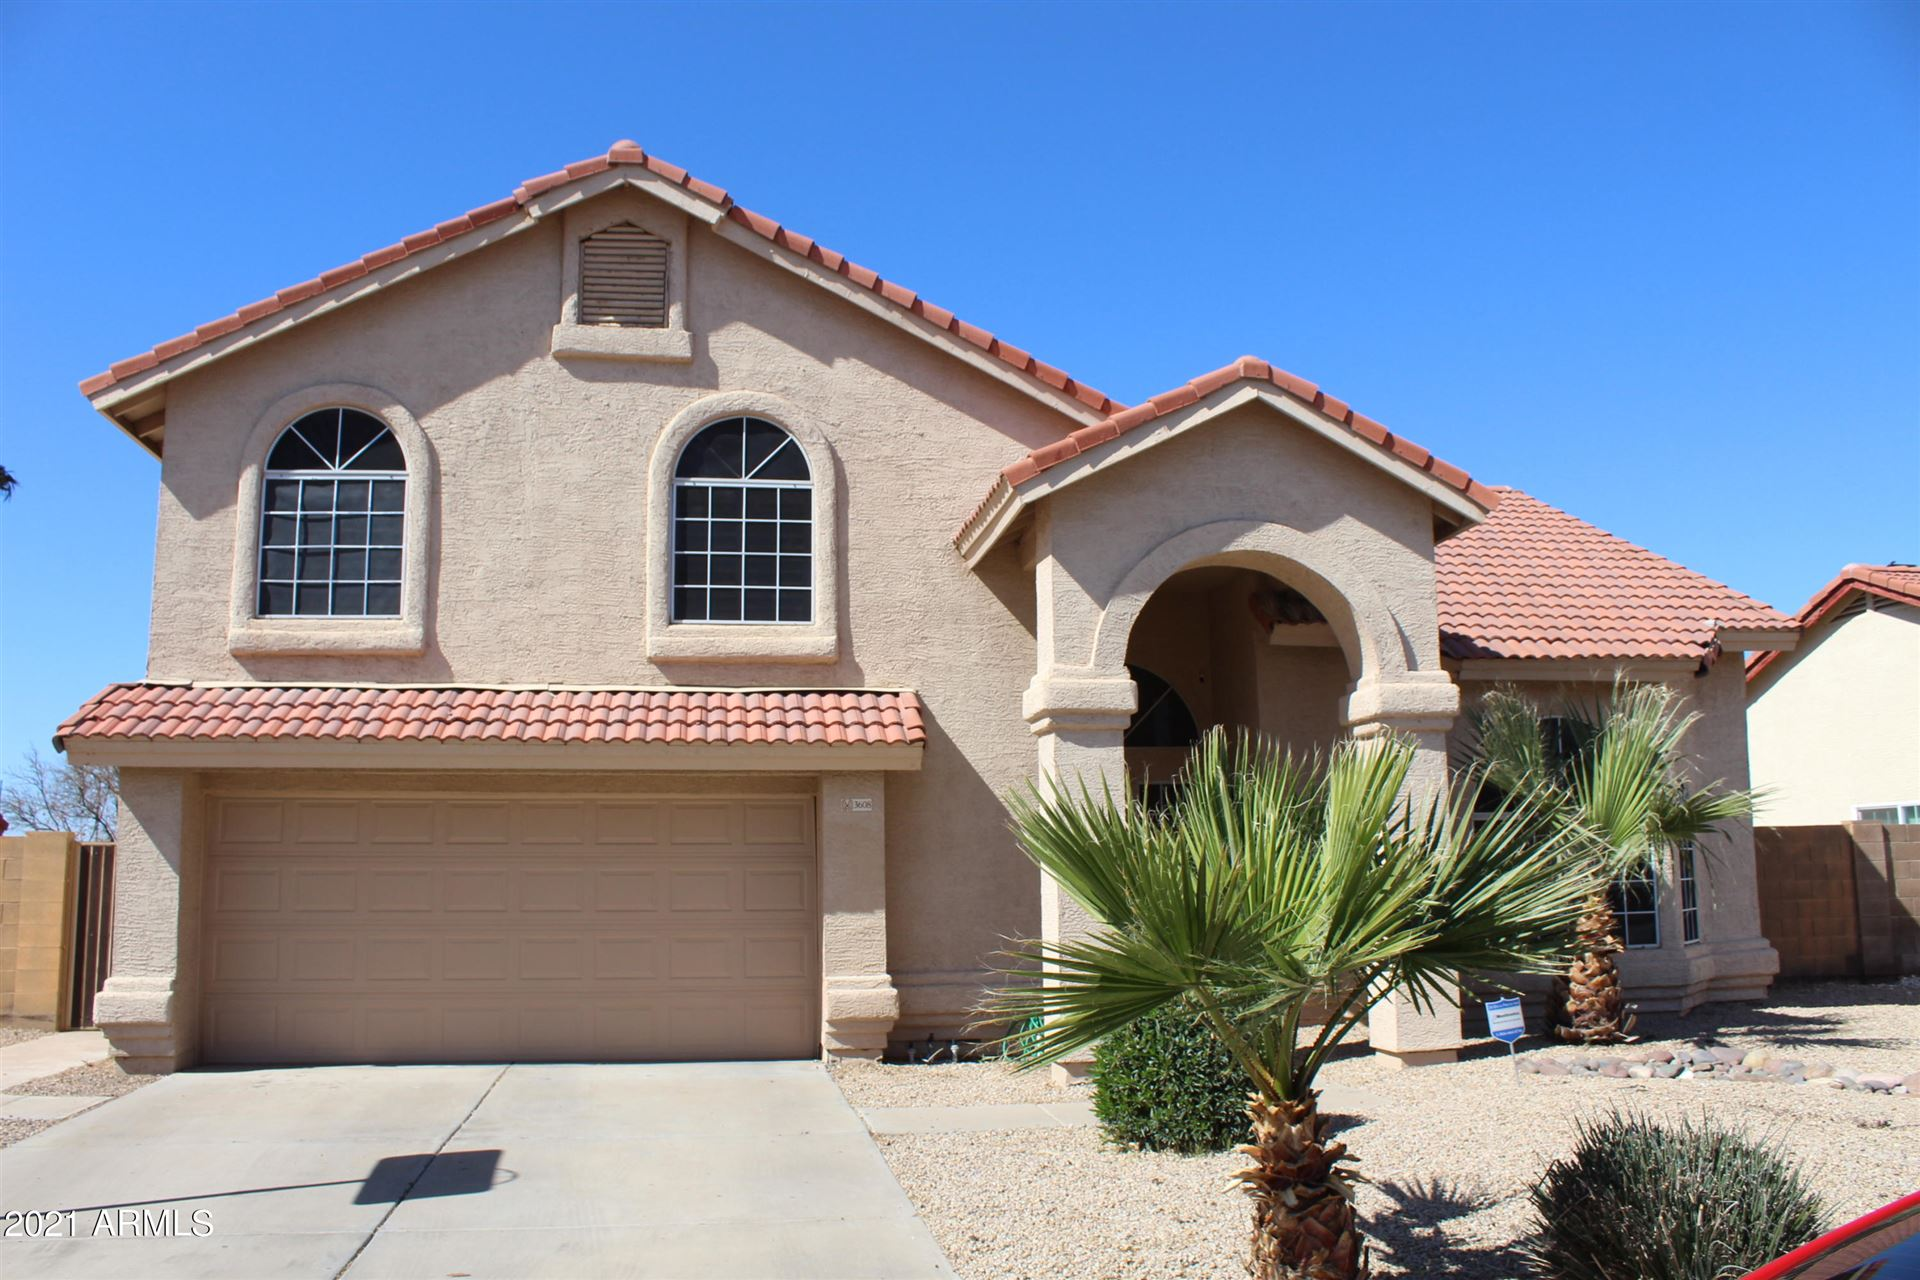 Photo of 3608 N COPENHAGEN Drive, Avondale, AZ 85392 (MLS # 6199207)